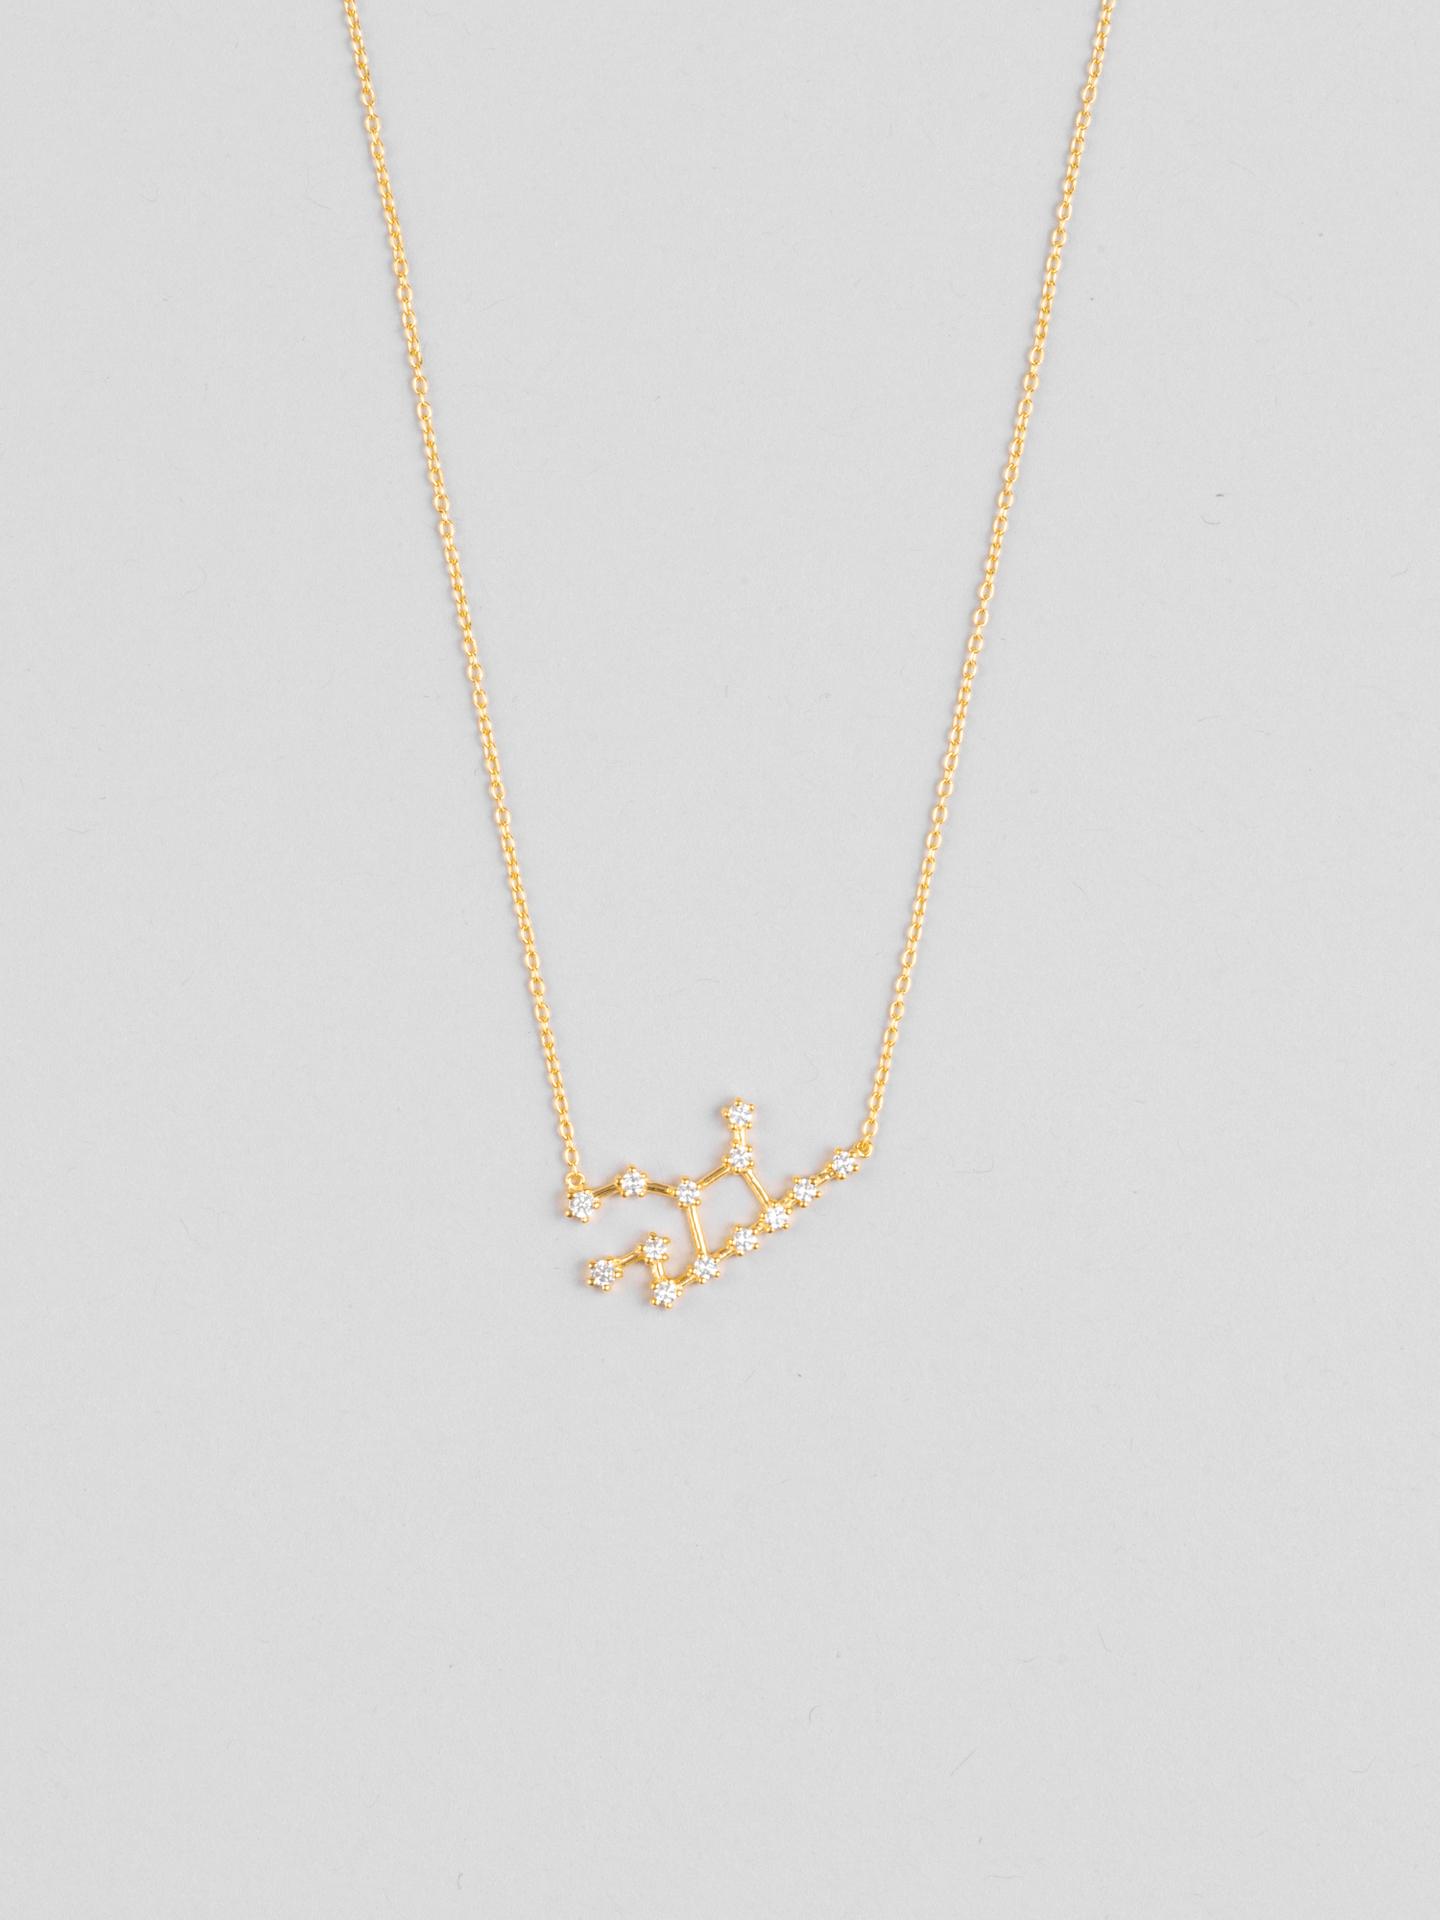 Virgo Zodiac Constellation Necklace